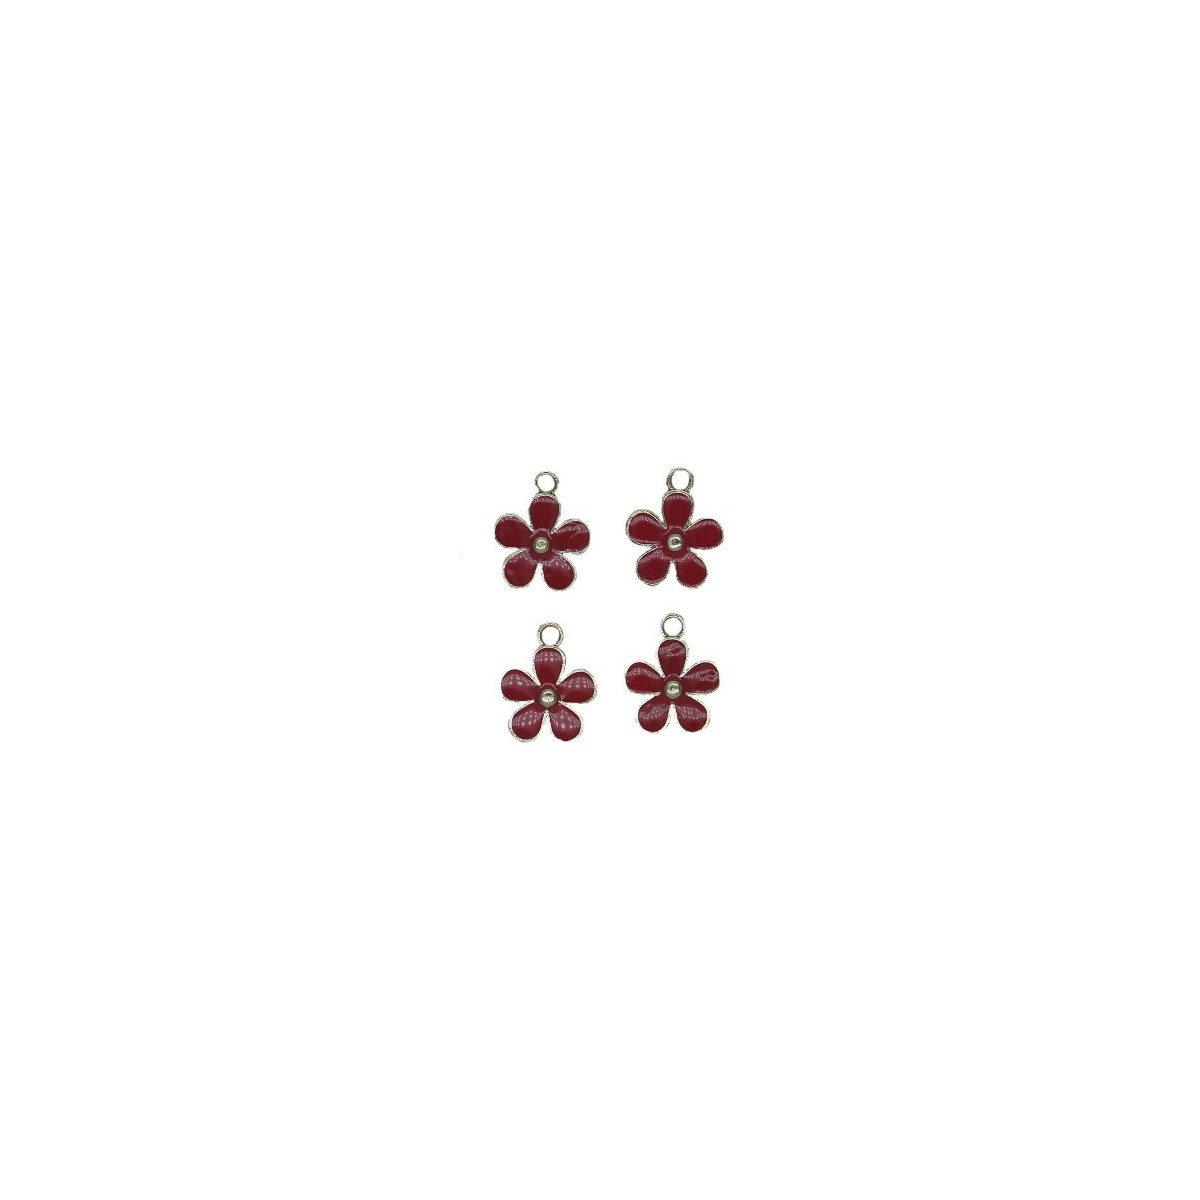 Charms Fiore Rosso 12 mm - 4 pezzi